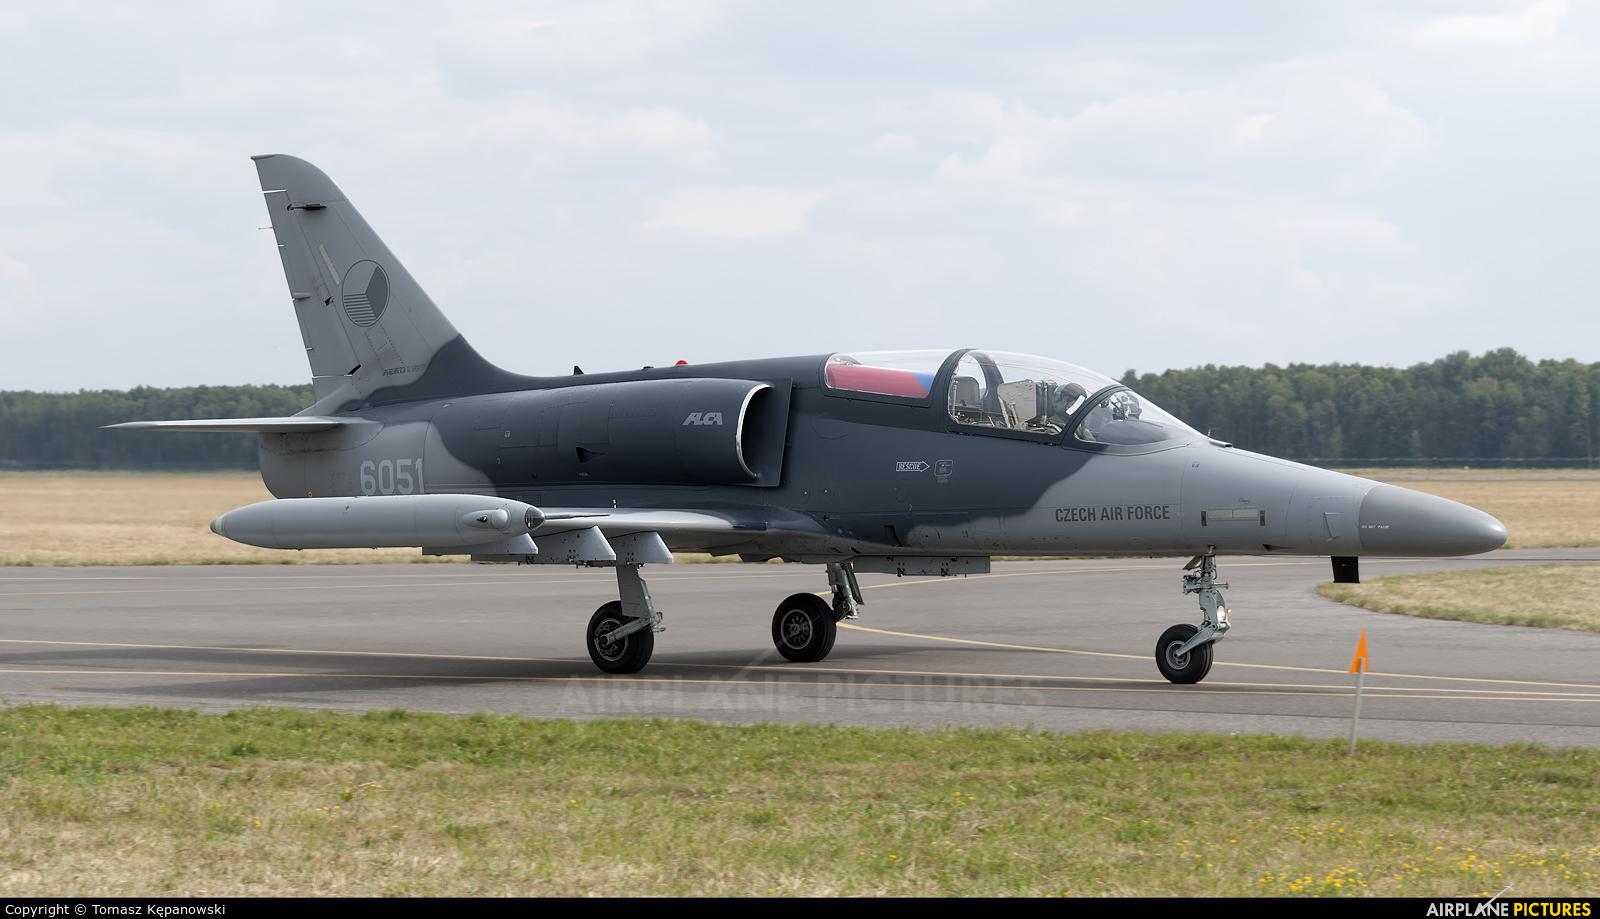 Czech - Air Force 6051 aircraft at Radom - Sadków